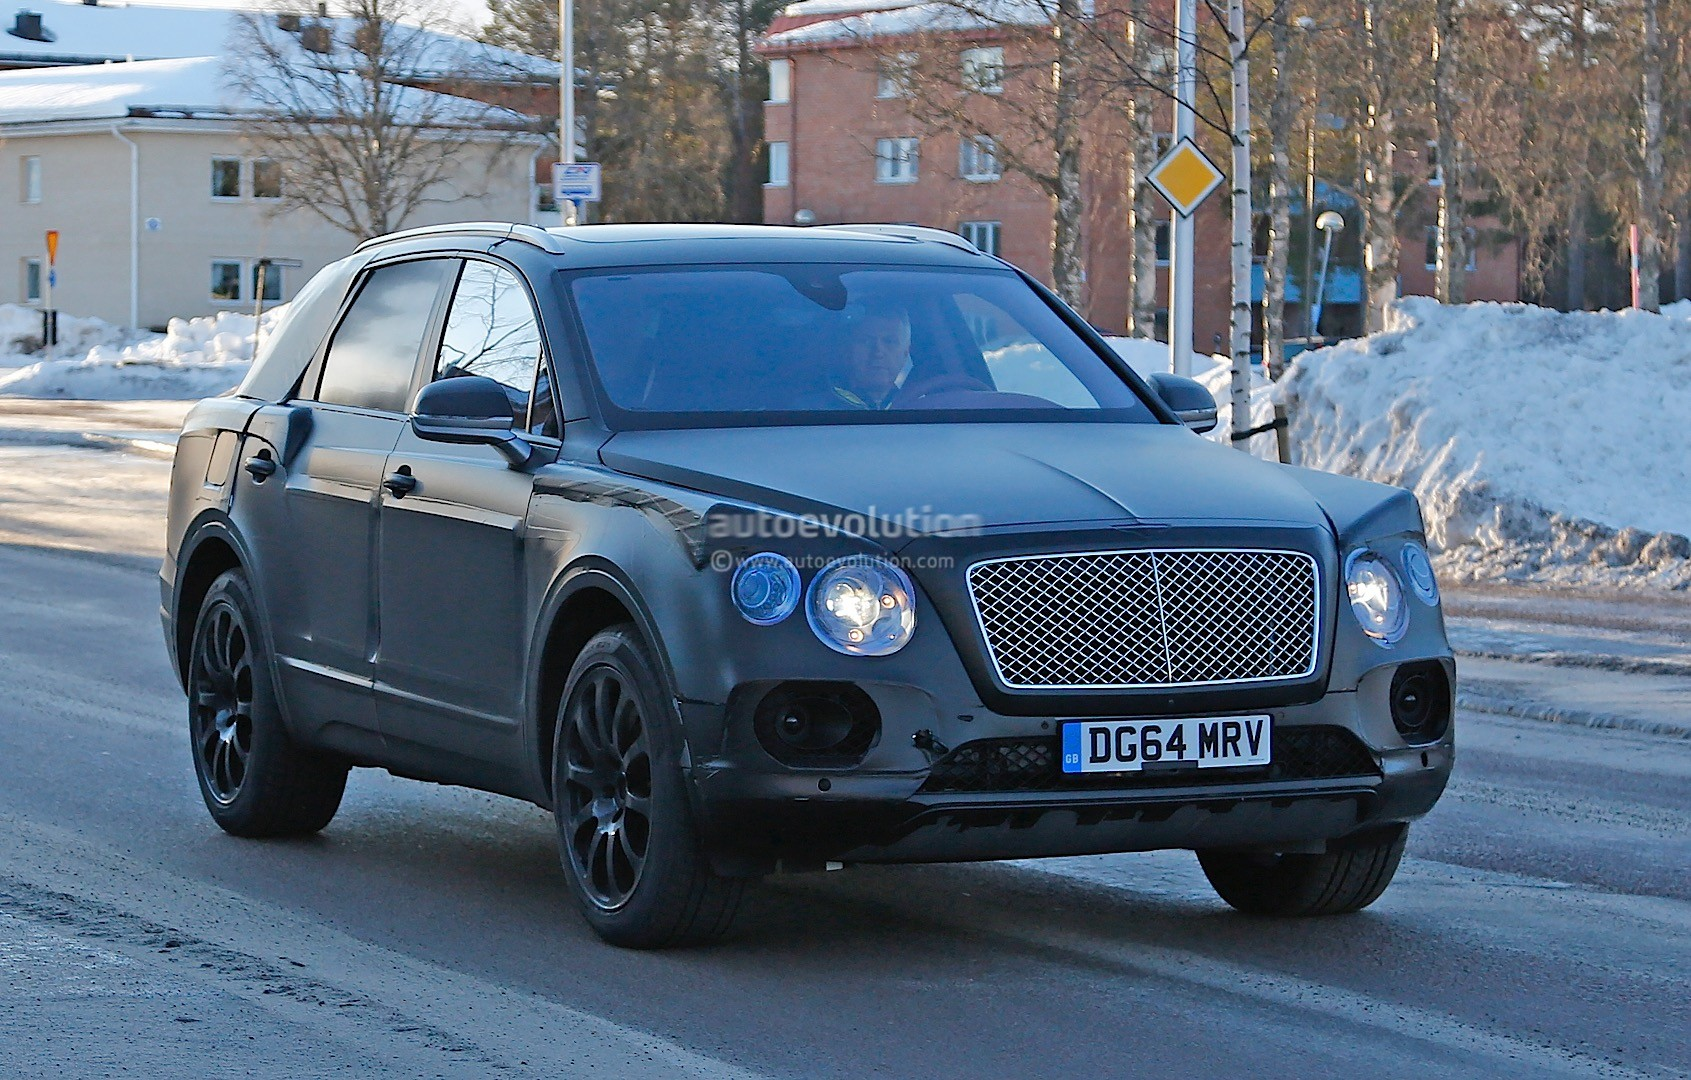 2015 - [Bentley] Bentayga - Page 5 Bentley-bentayga-spied-once-again-looks-like-an-edgier-vw-touareg-photo-gallery_3